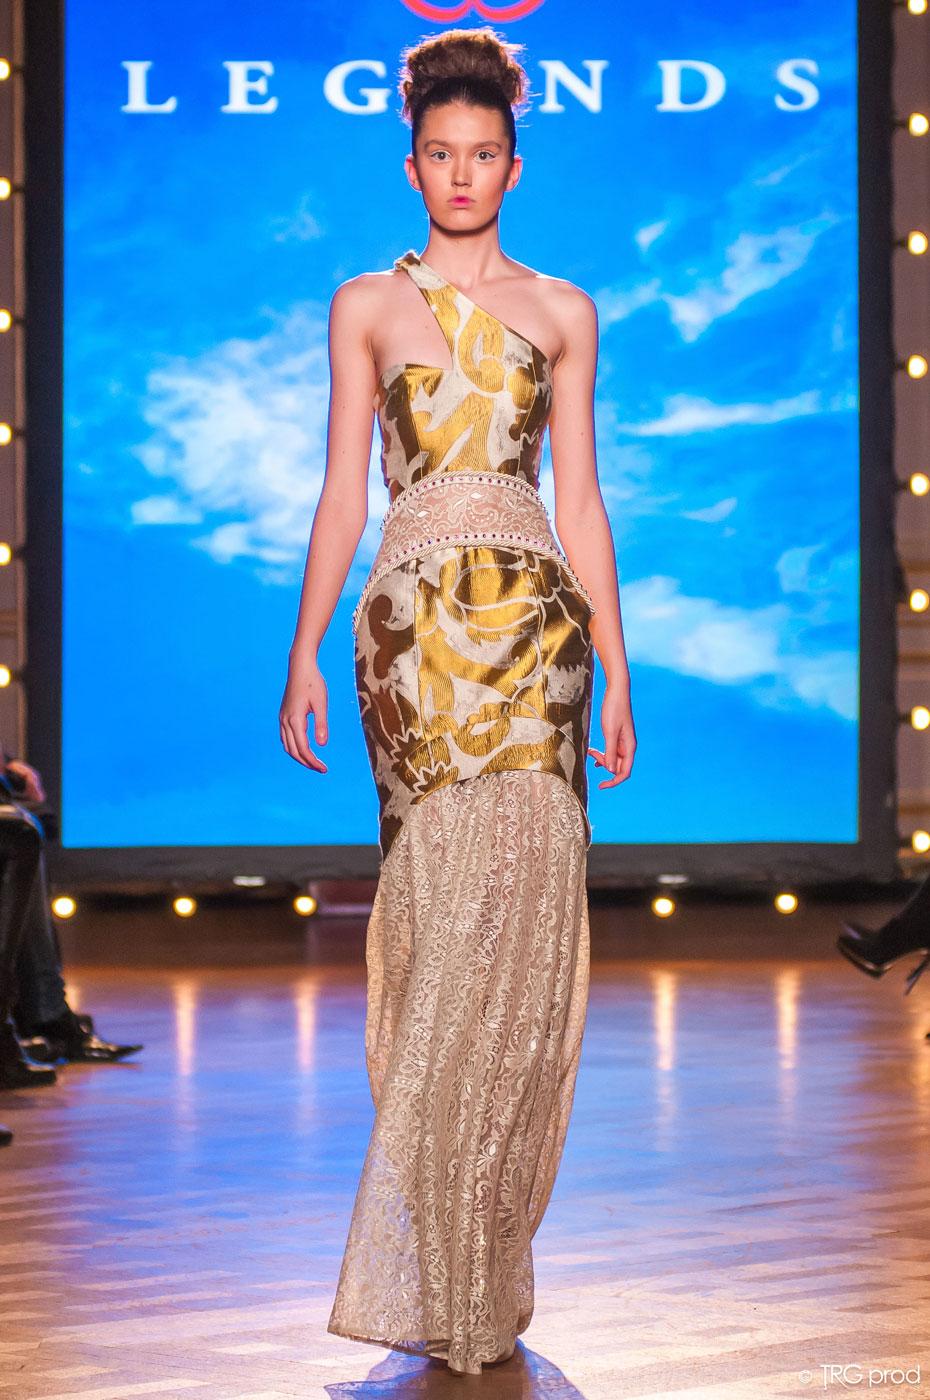 Legends-fashion-runway-show-haute-couture-paris-spring-2015-the-impression-12